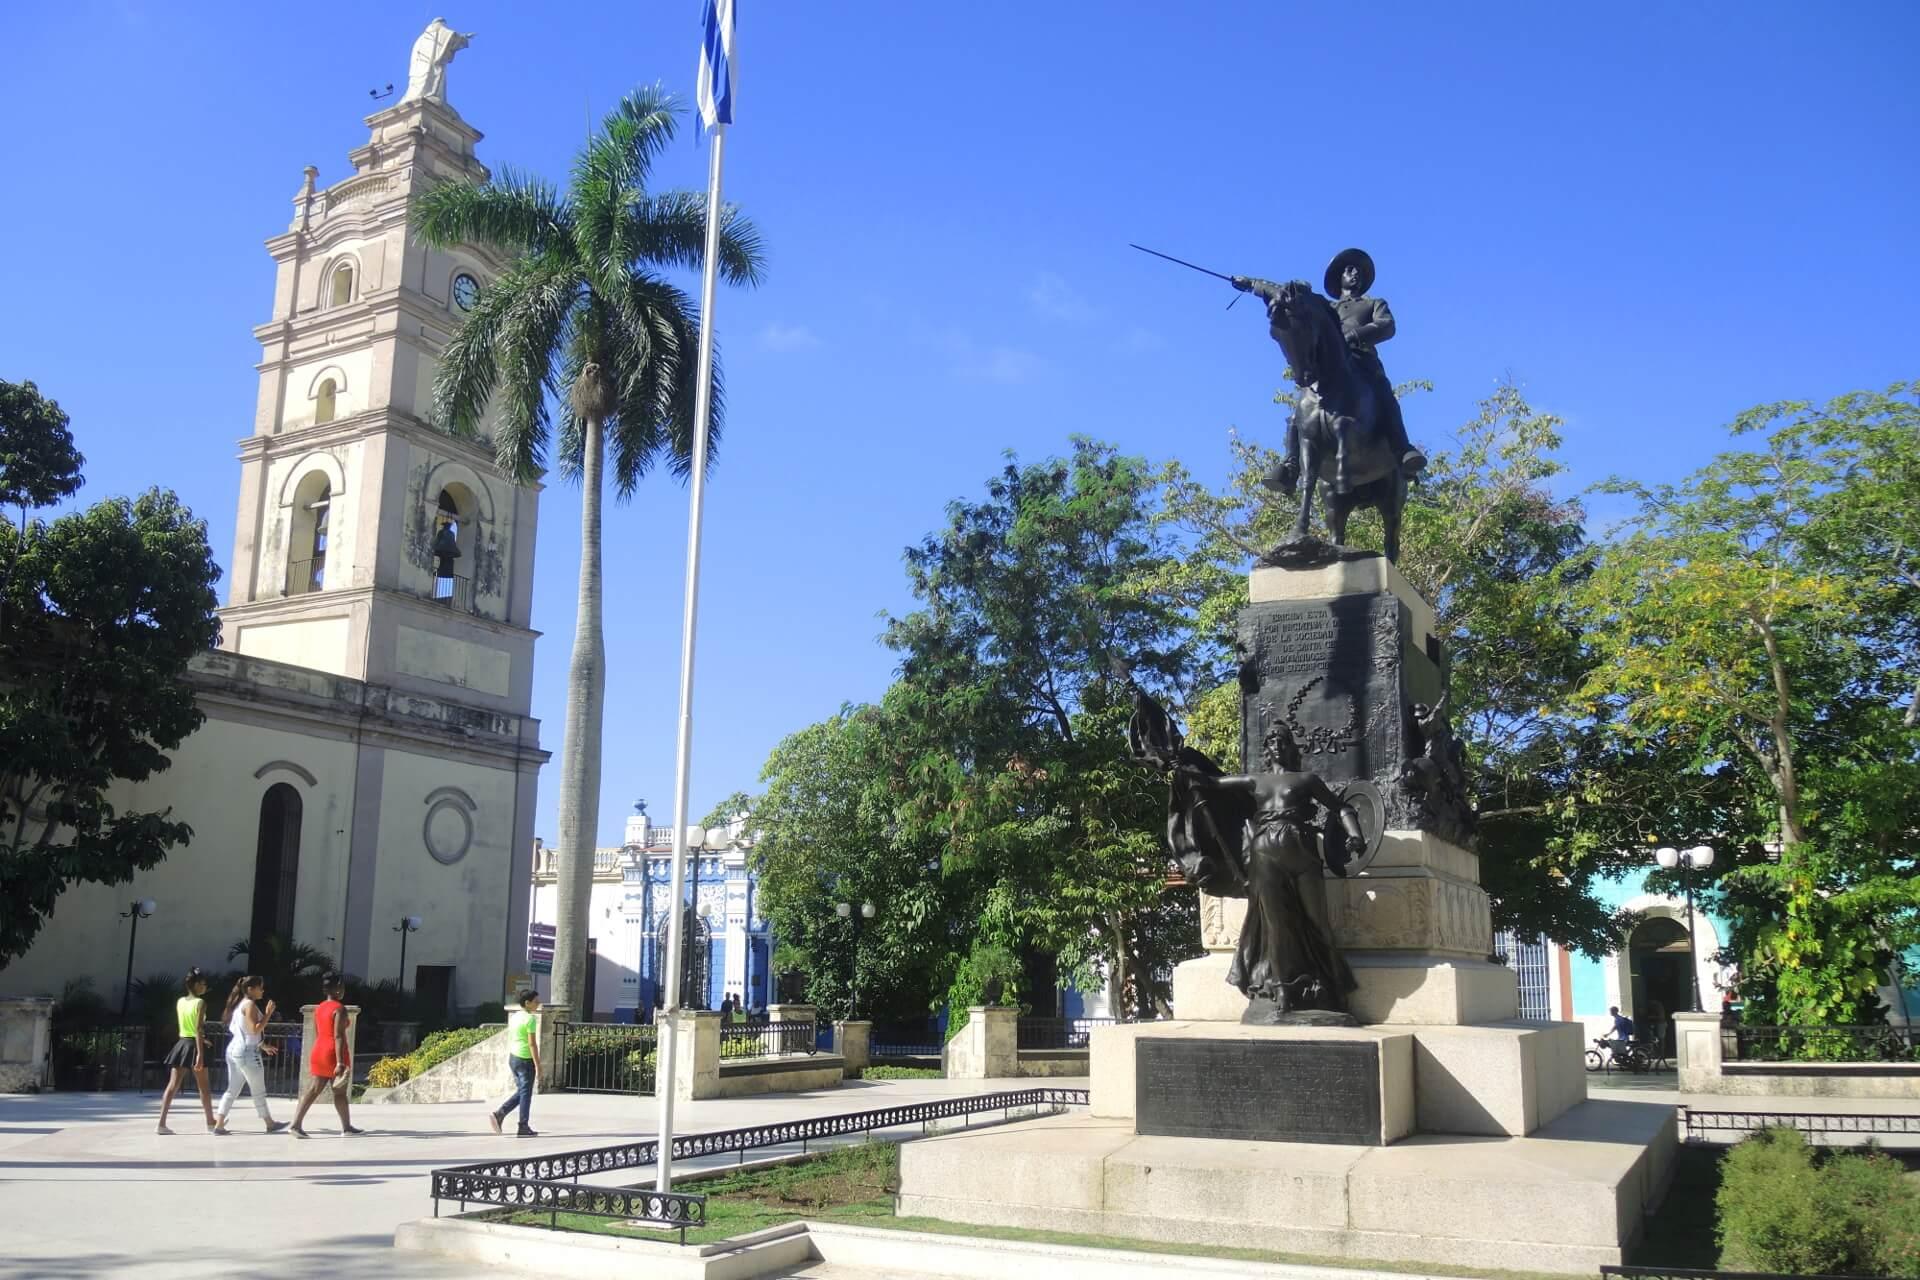 Sehenswürdigkeiten in Kuba - Camaguey Parque Ignacio Agramonte